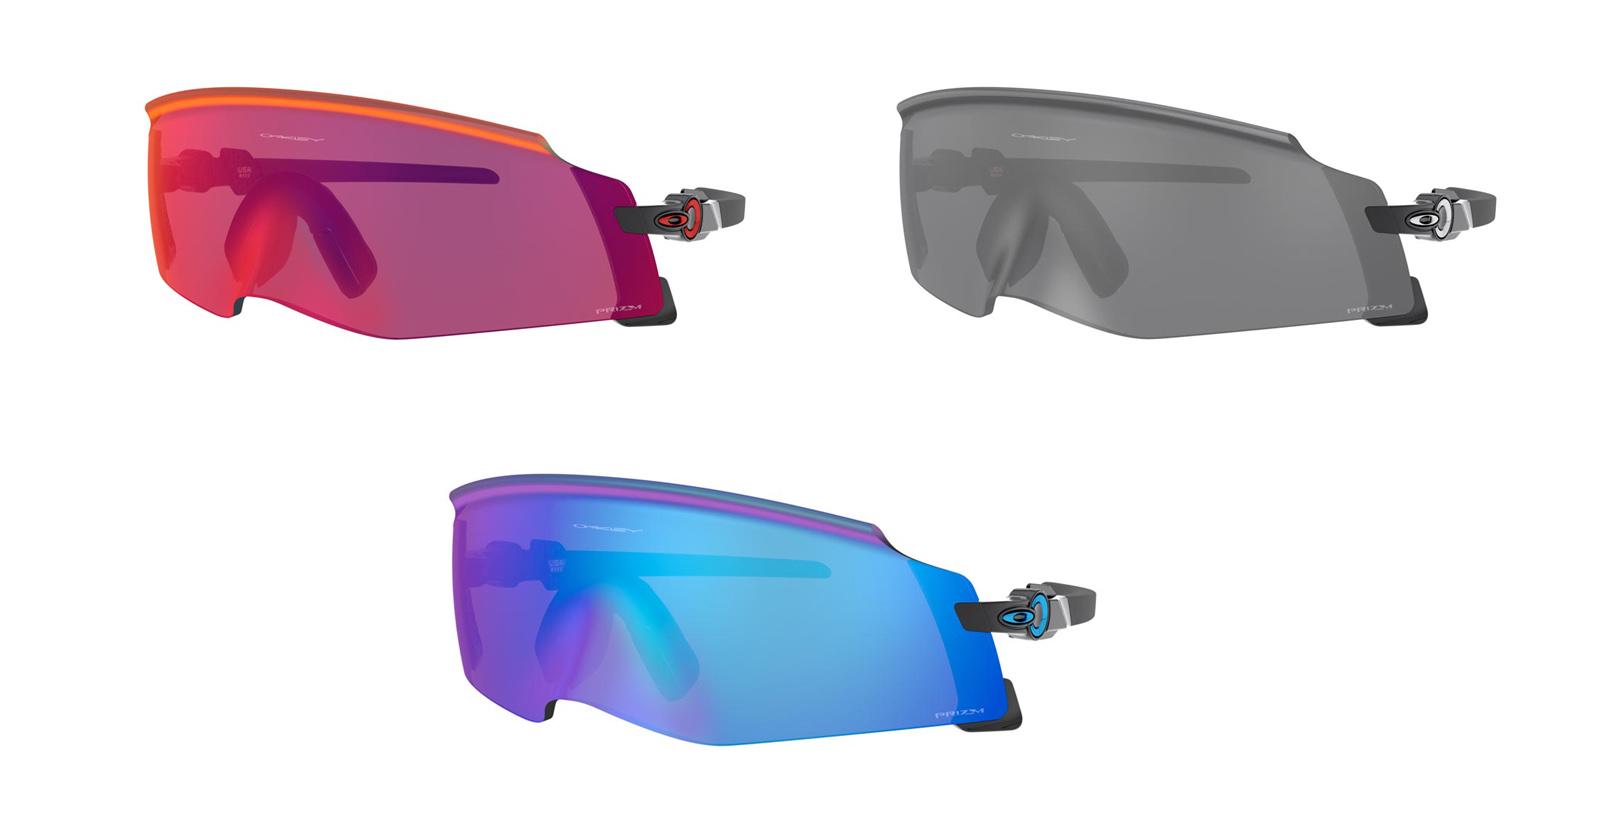 Oakley KAto colors of prizm lenses